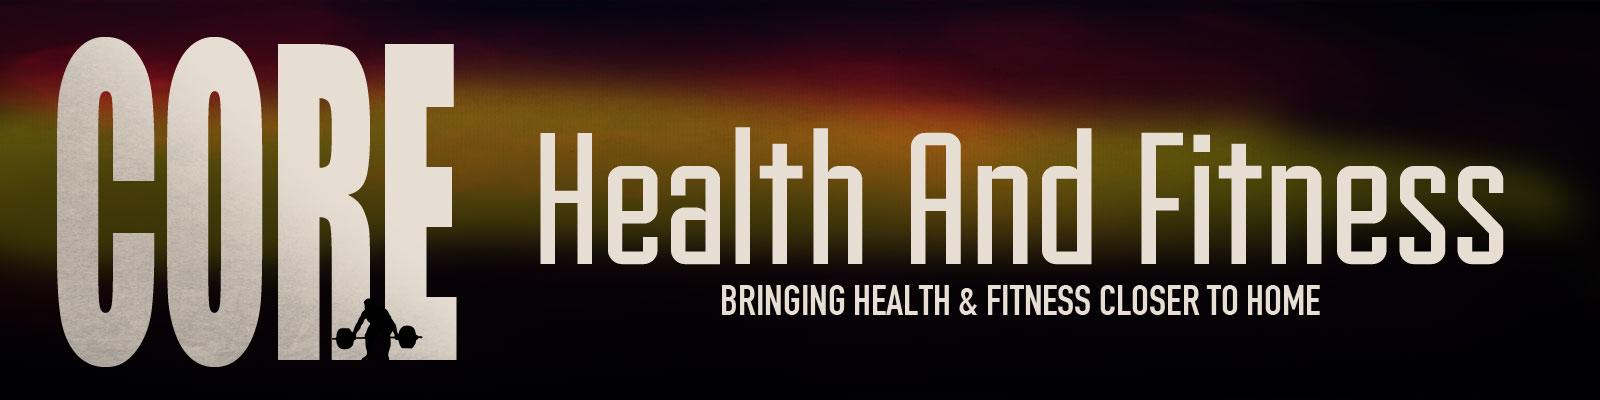 Core Health & Fitness Durrow